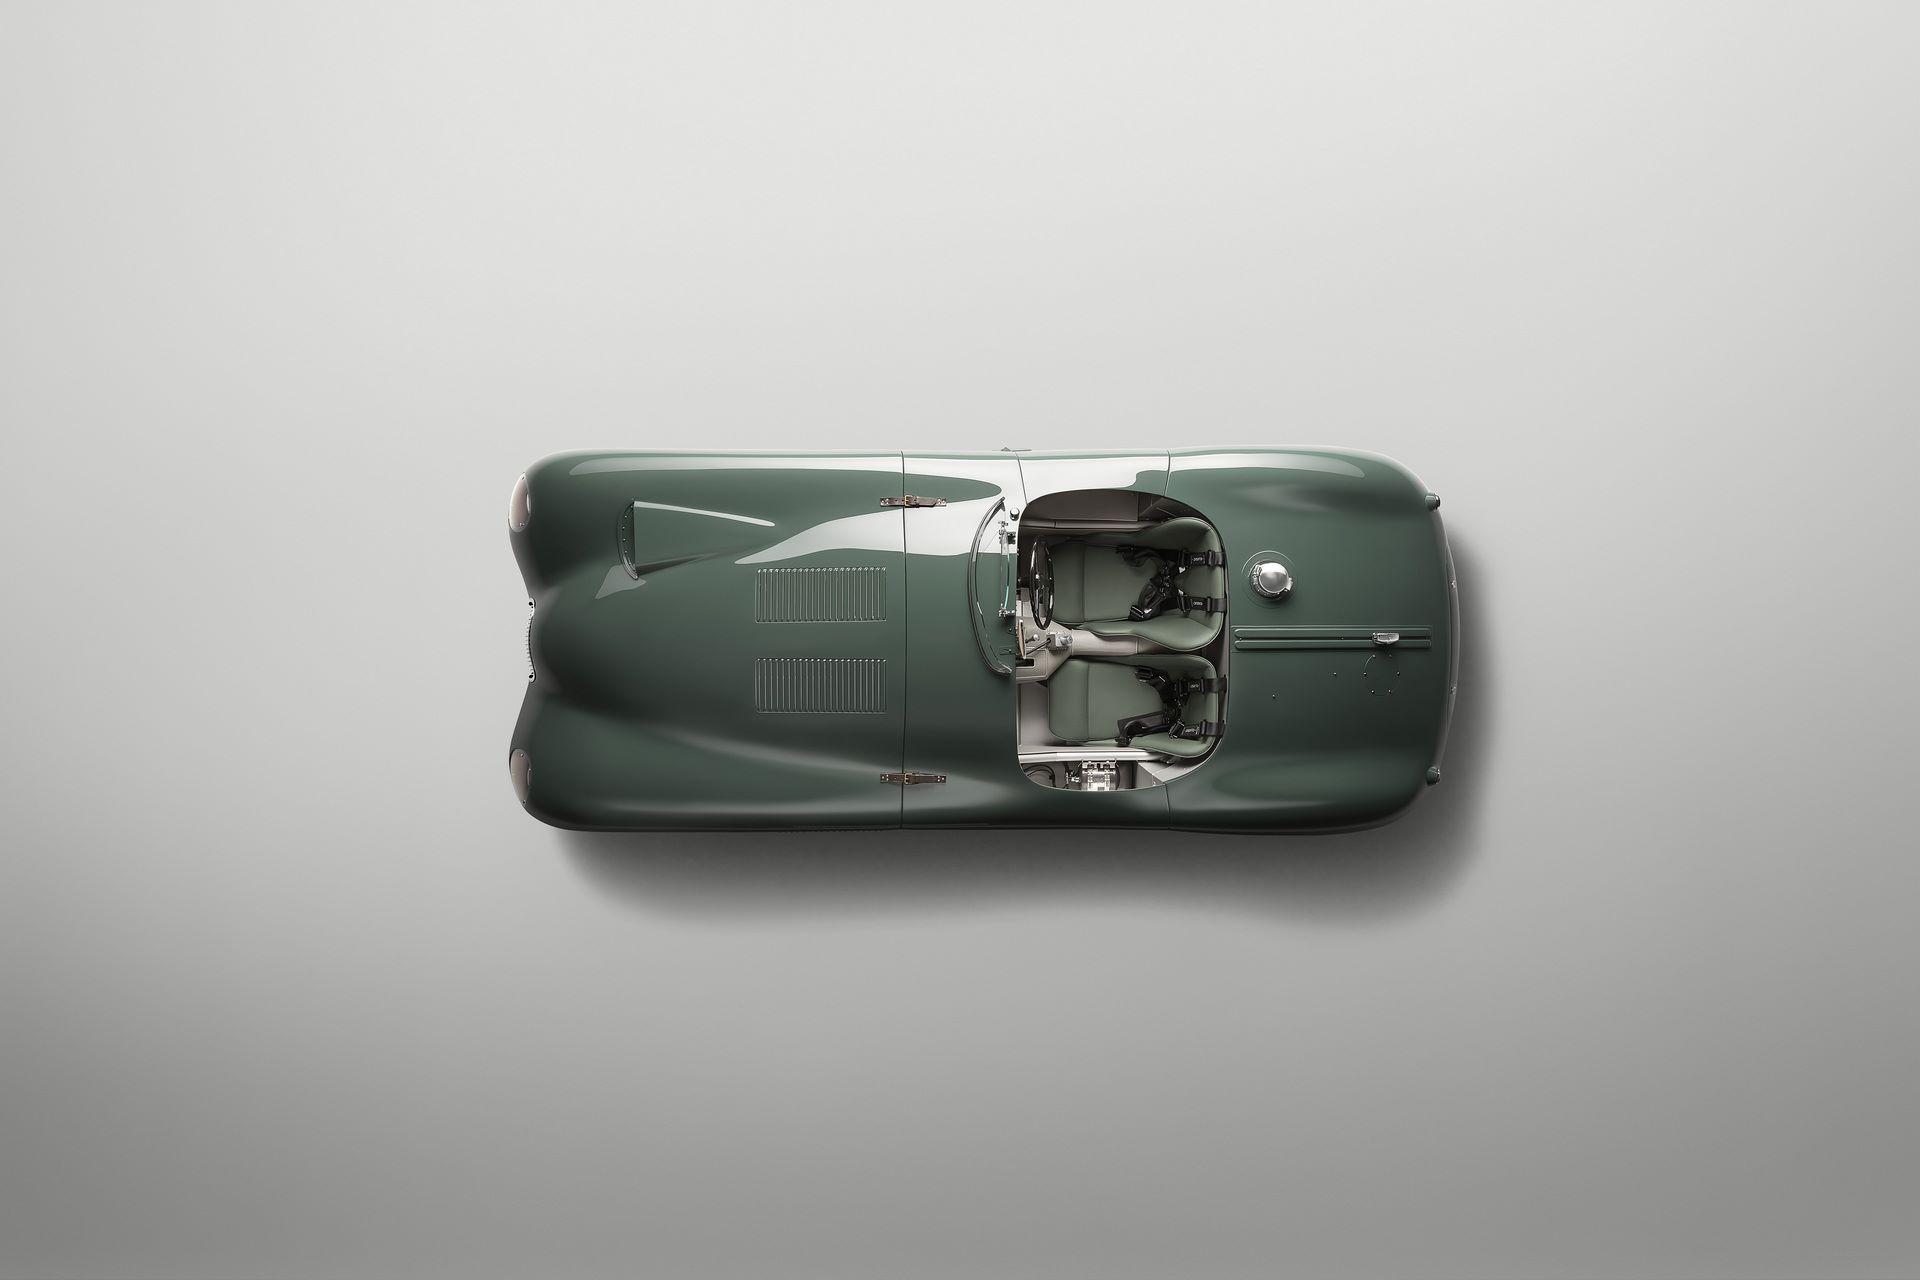 Jaguar-C-type-Continuation-4